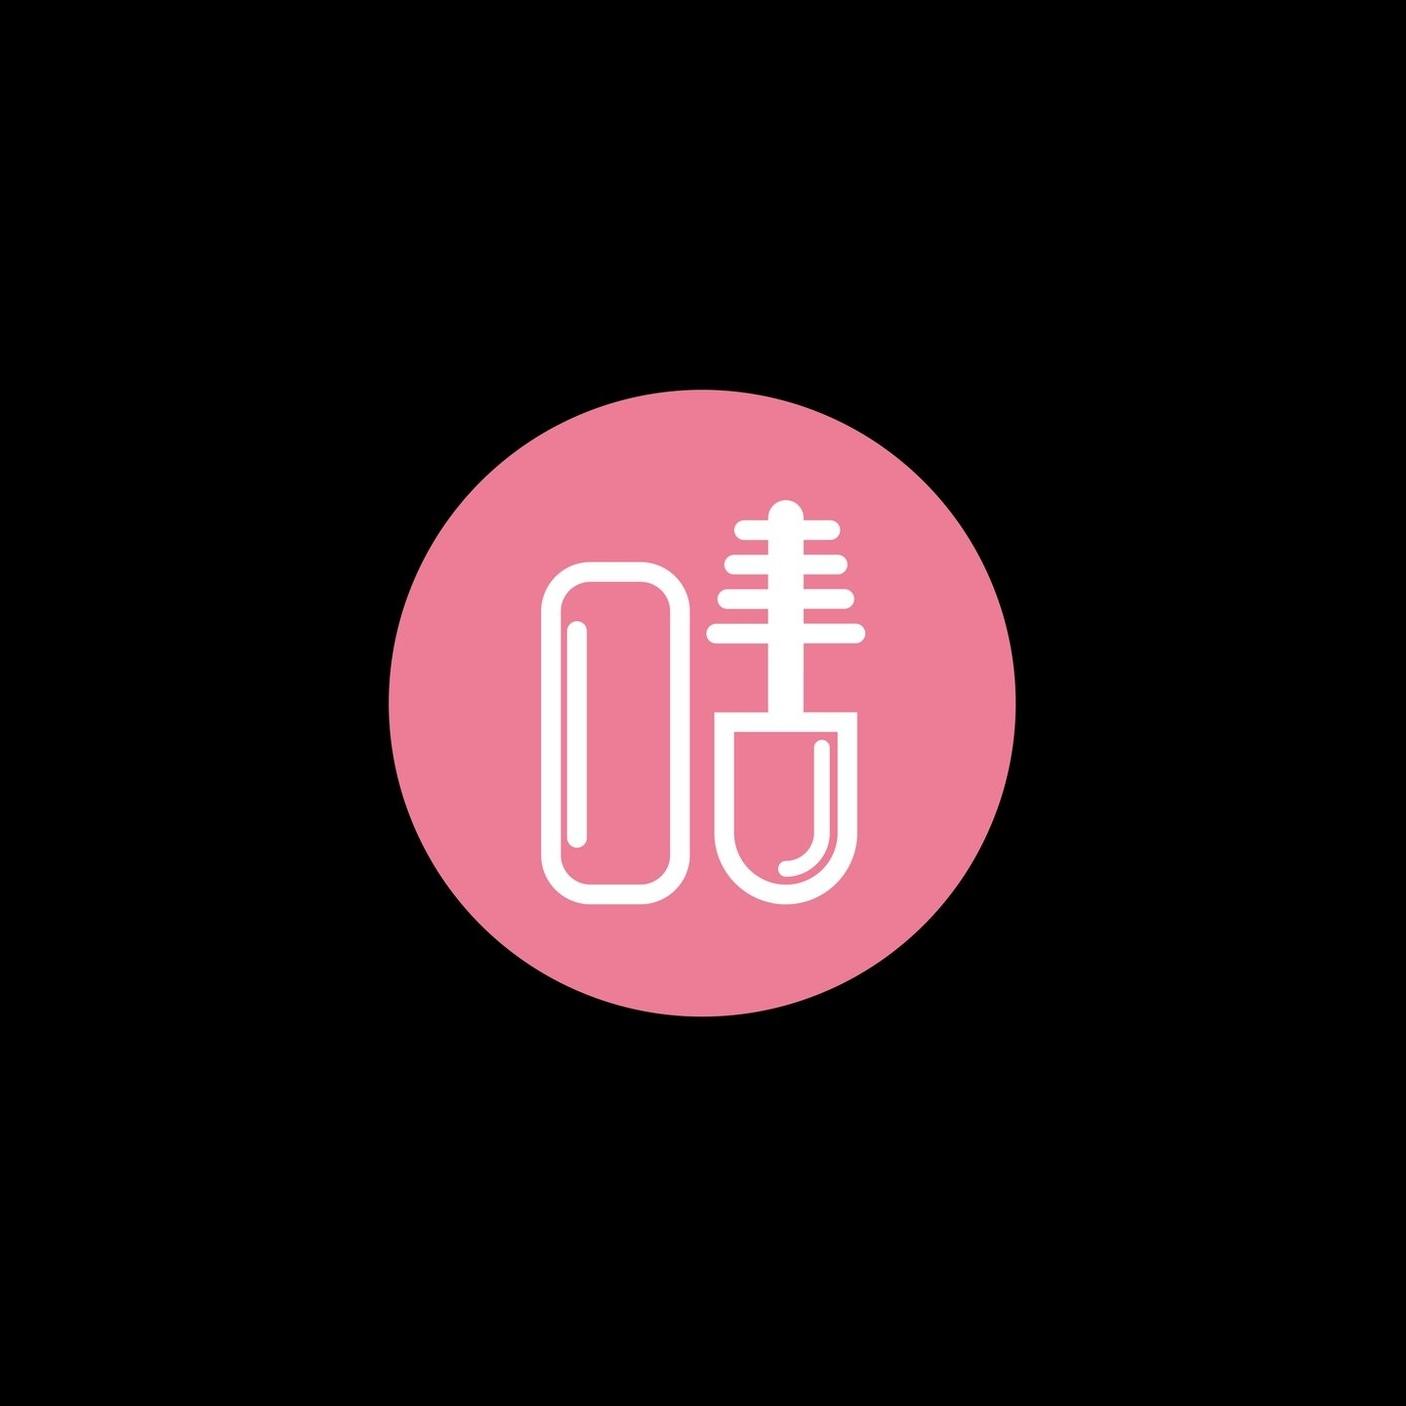 Blue Pink Circles Beauty Makeup Youtube Channel Art (1).jpg